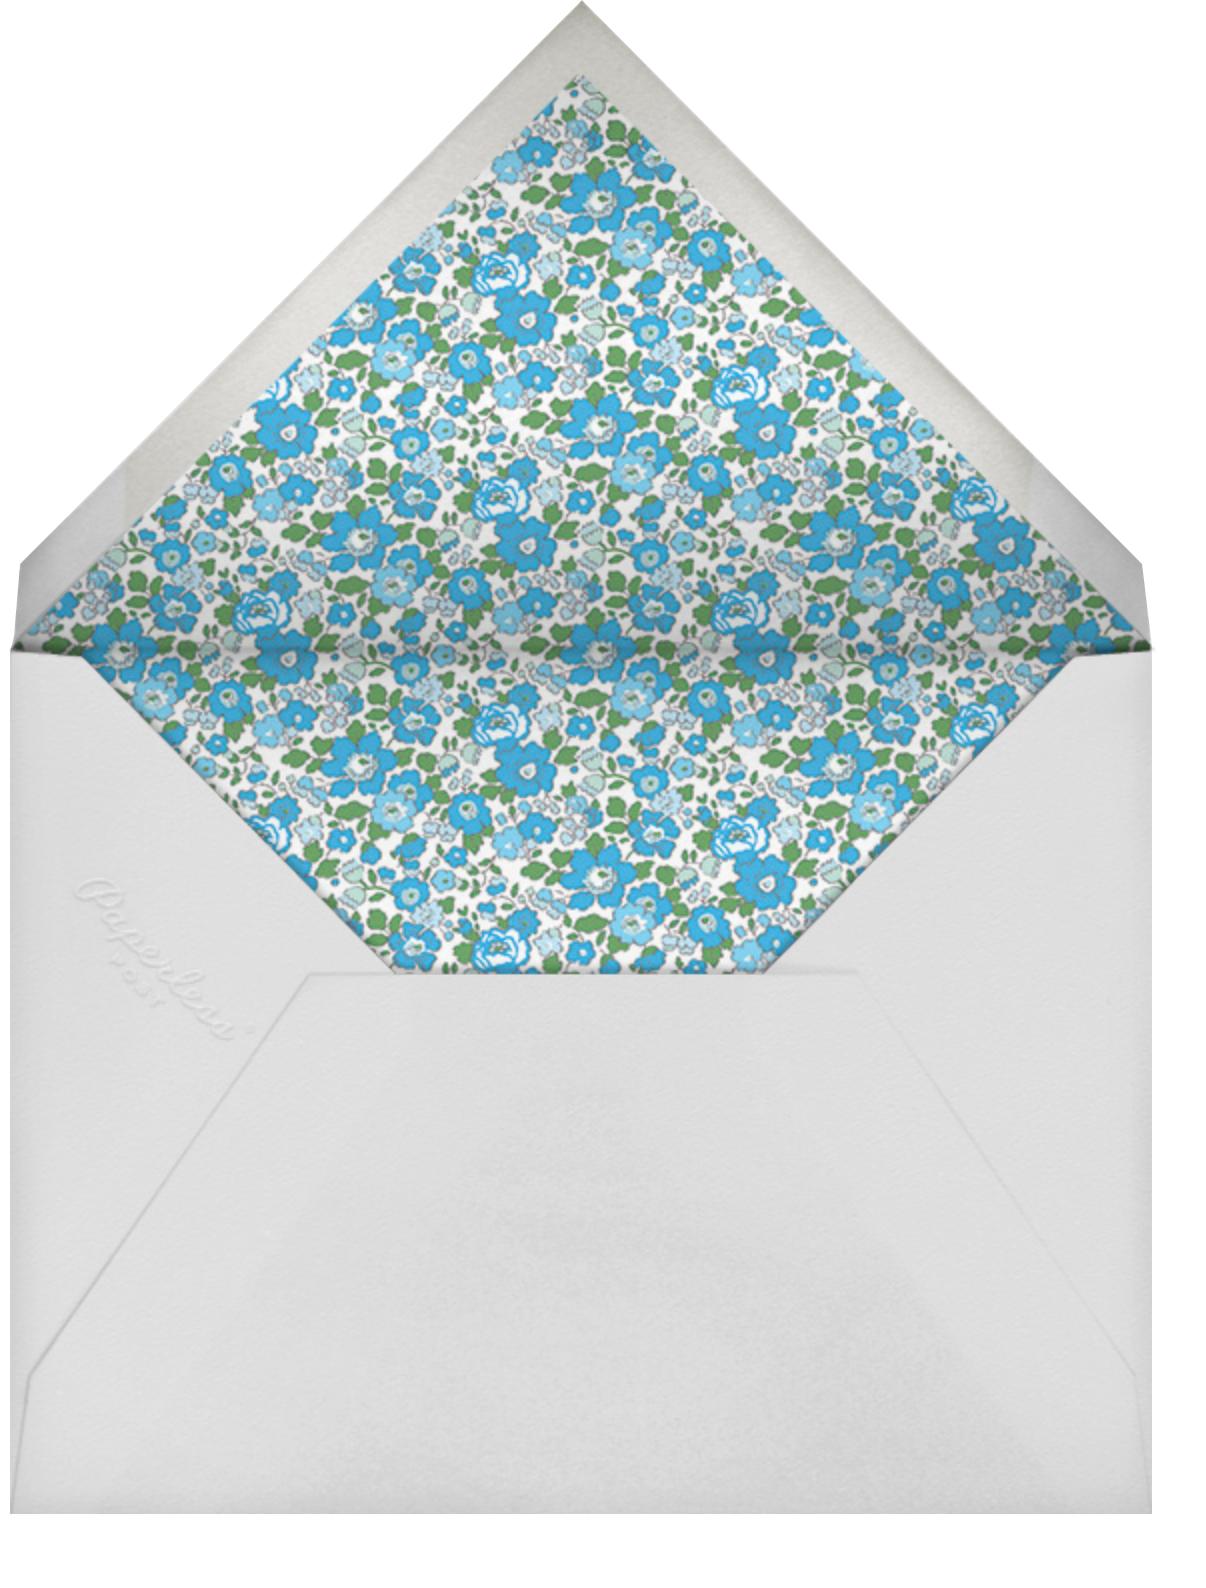 Betsy (Horizontal) - Capri - Liberty - Liberty Fabrics - envelope back